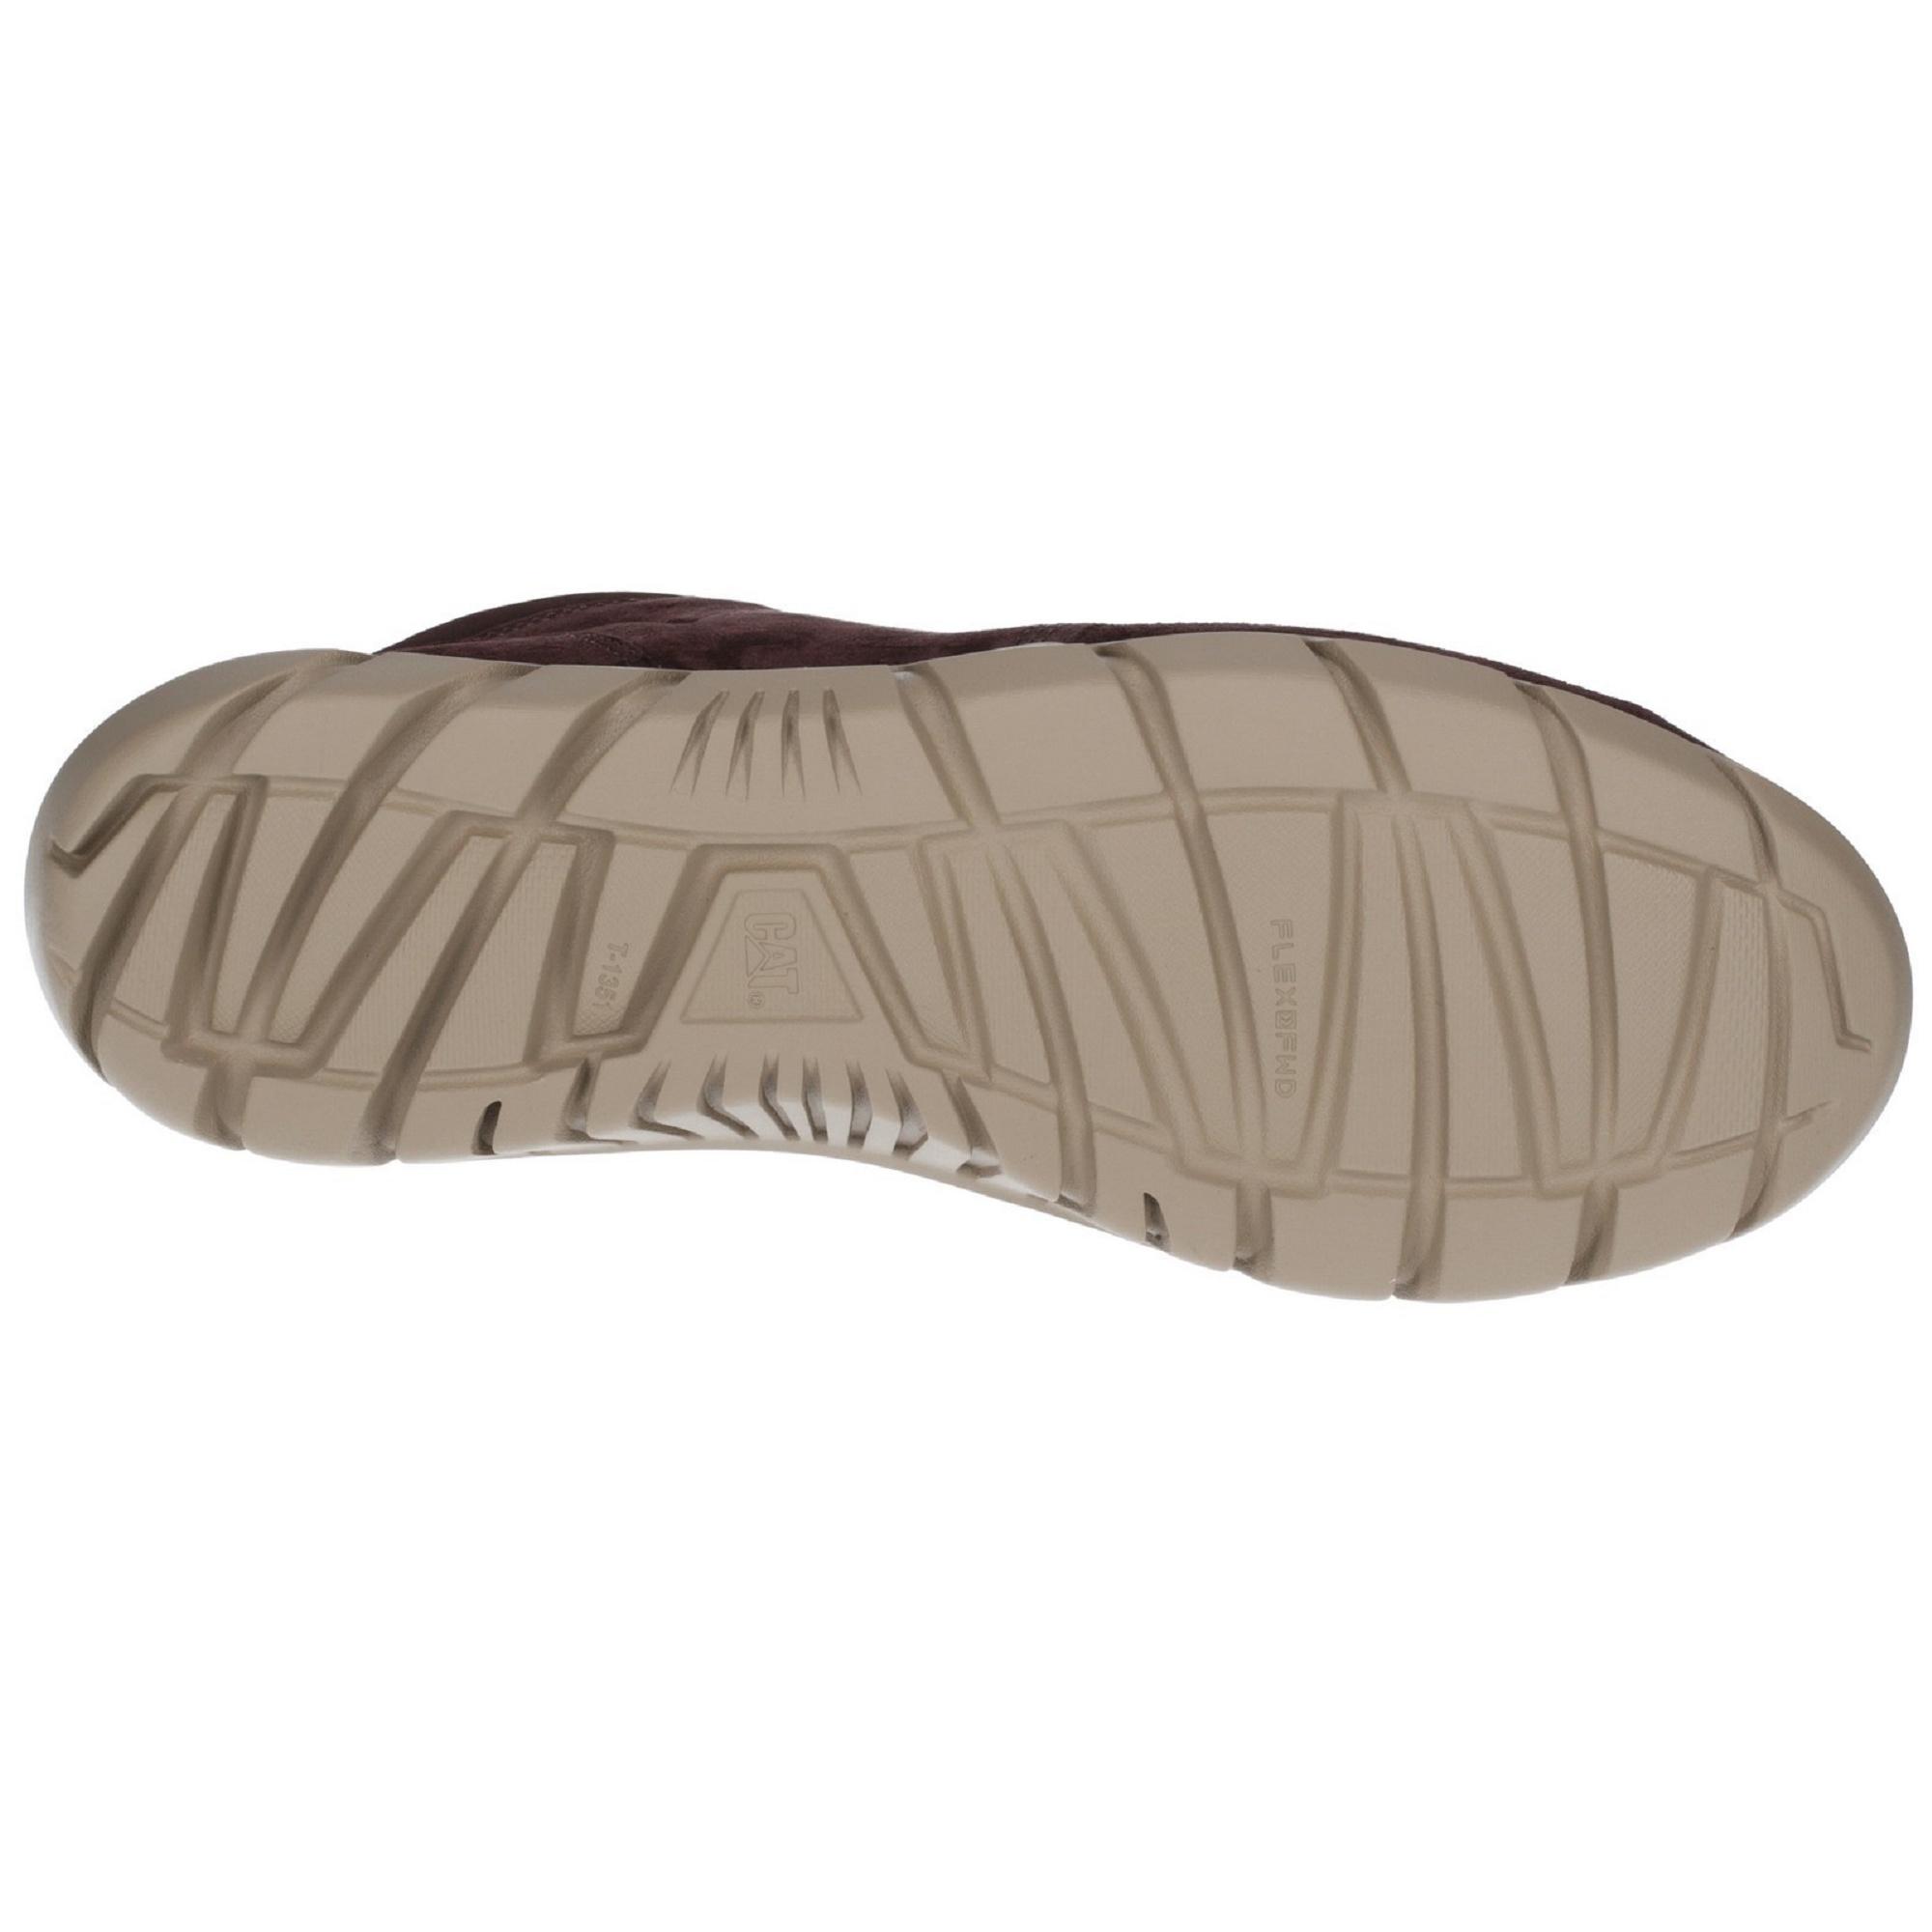 Caterpillar - Botas de piel Hendon con cordones para chico hombre Café